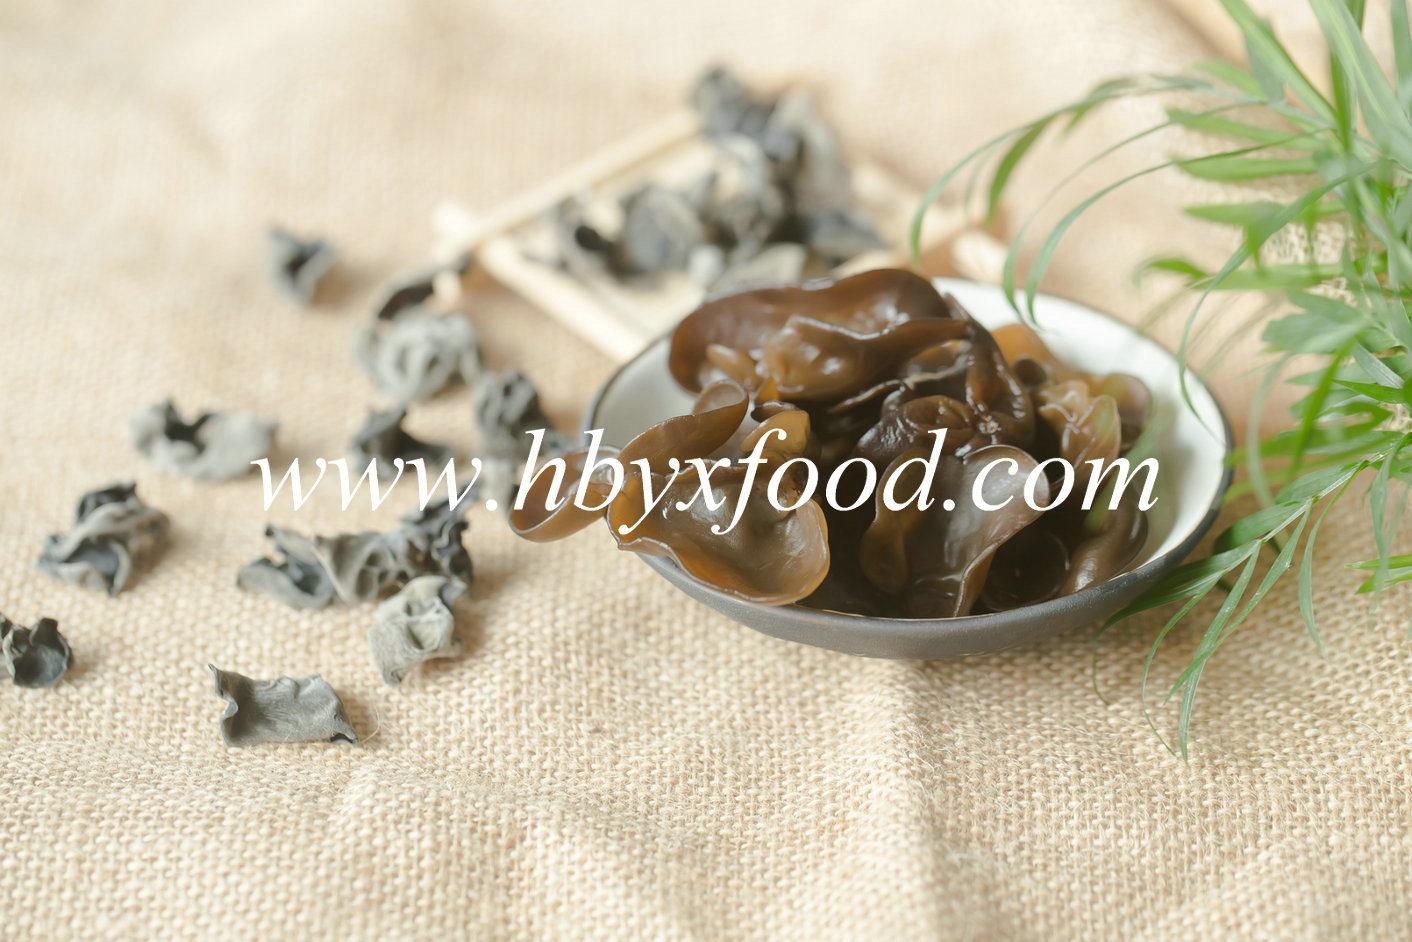 Dried Black Fungus Dehydrated Vegetables in 3kg Pack